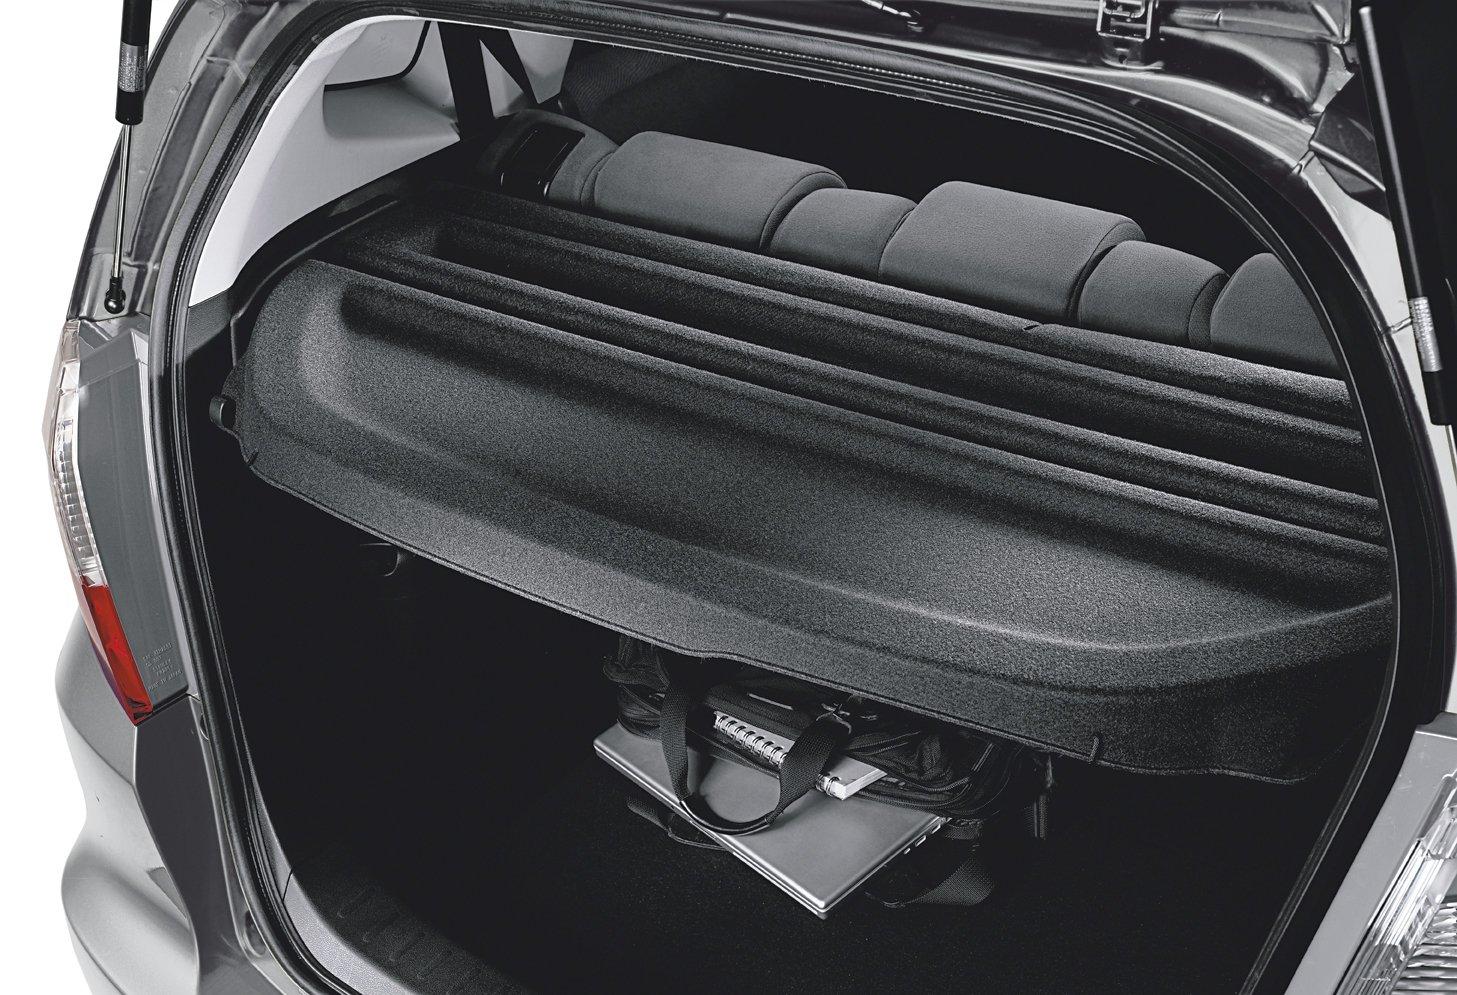 Genuine Honda 08U35-TK6-111 Cargo Cover